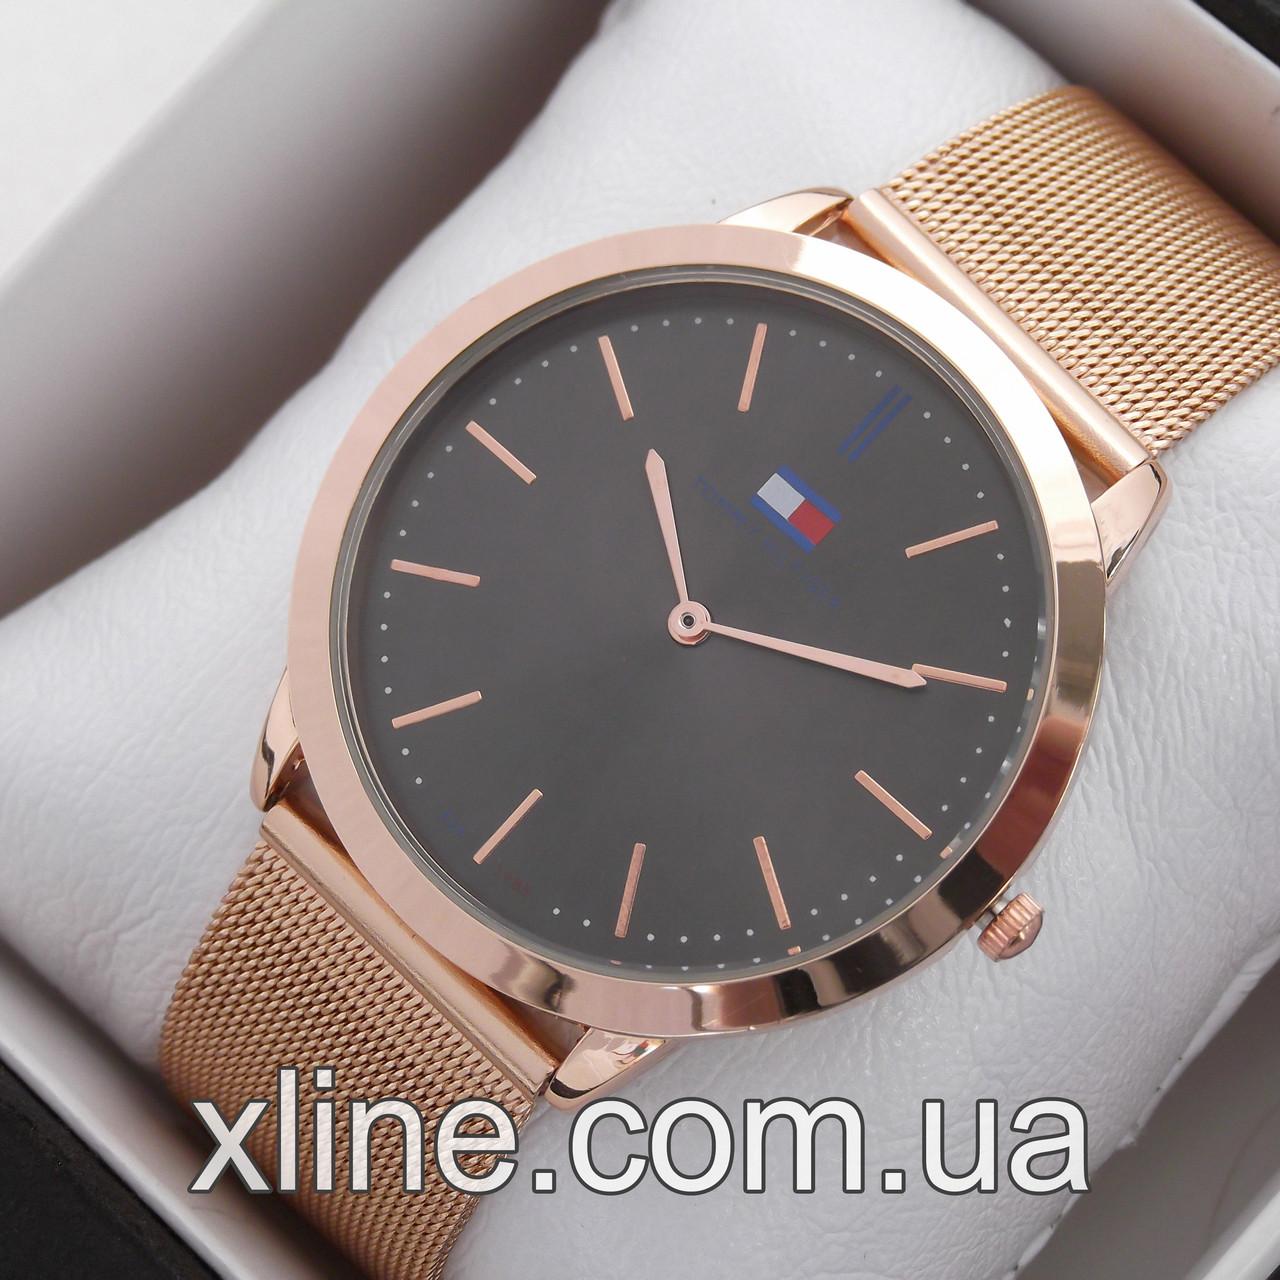 143b3e0c Женские наручные часы Tommy Hilfiger 2140 на металлическом браслете ...